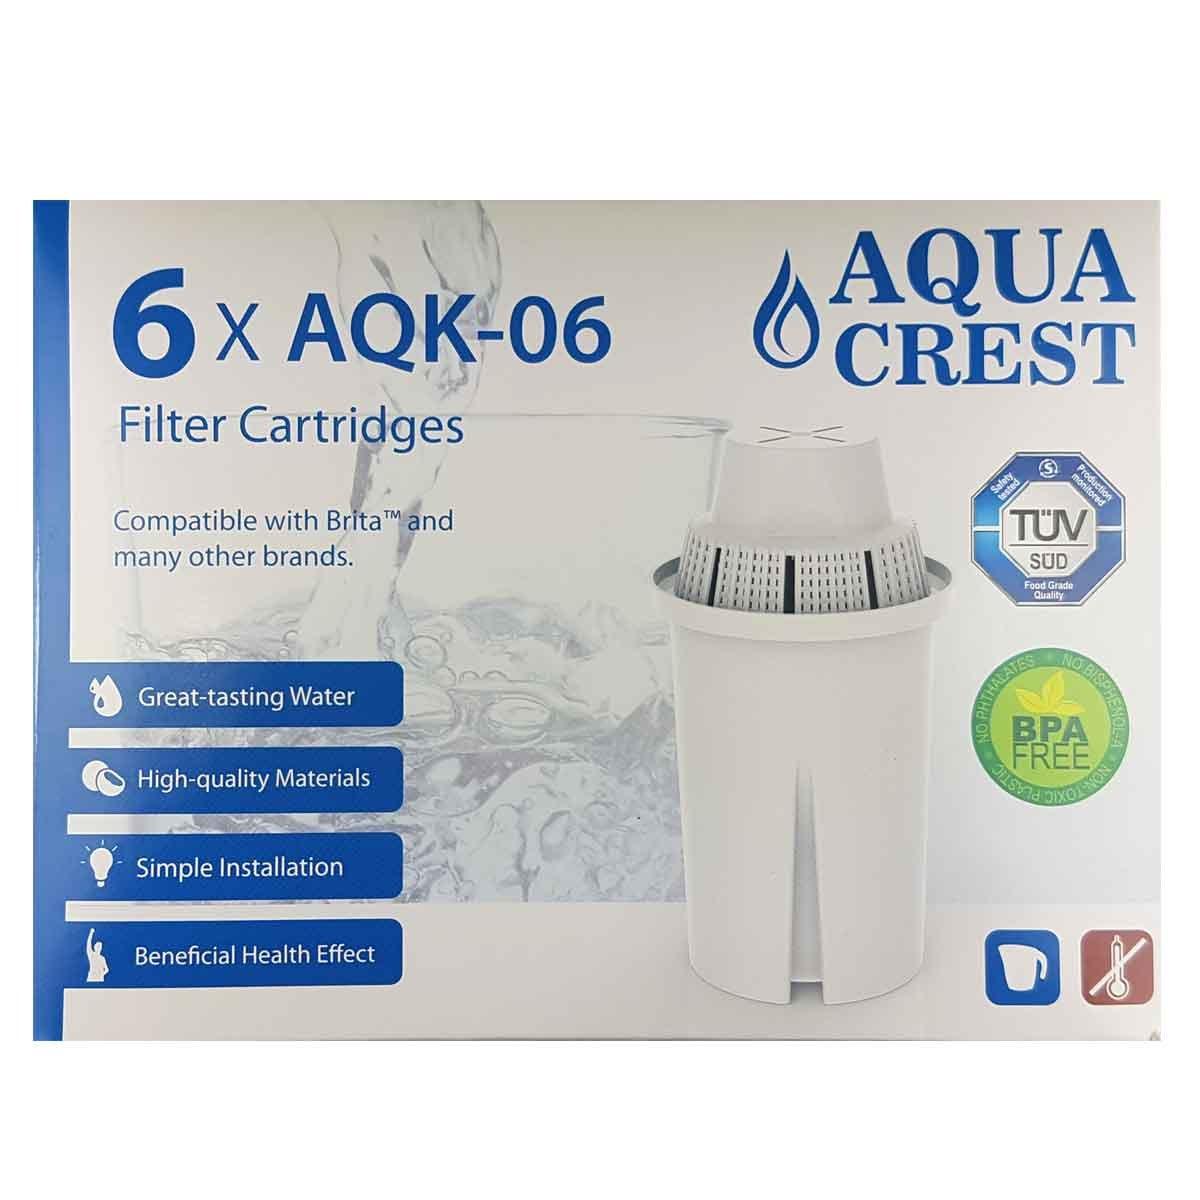 6 filtri - Aquacrest AQK06. 12 mesi di filtraggio per Brita Classic Sostituisce: Brita Classic, Laica MultiFlux, BWT Gourmet Mg²+, EasyFiltra+ Terraillon VYAIR